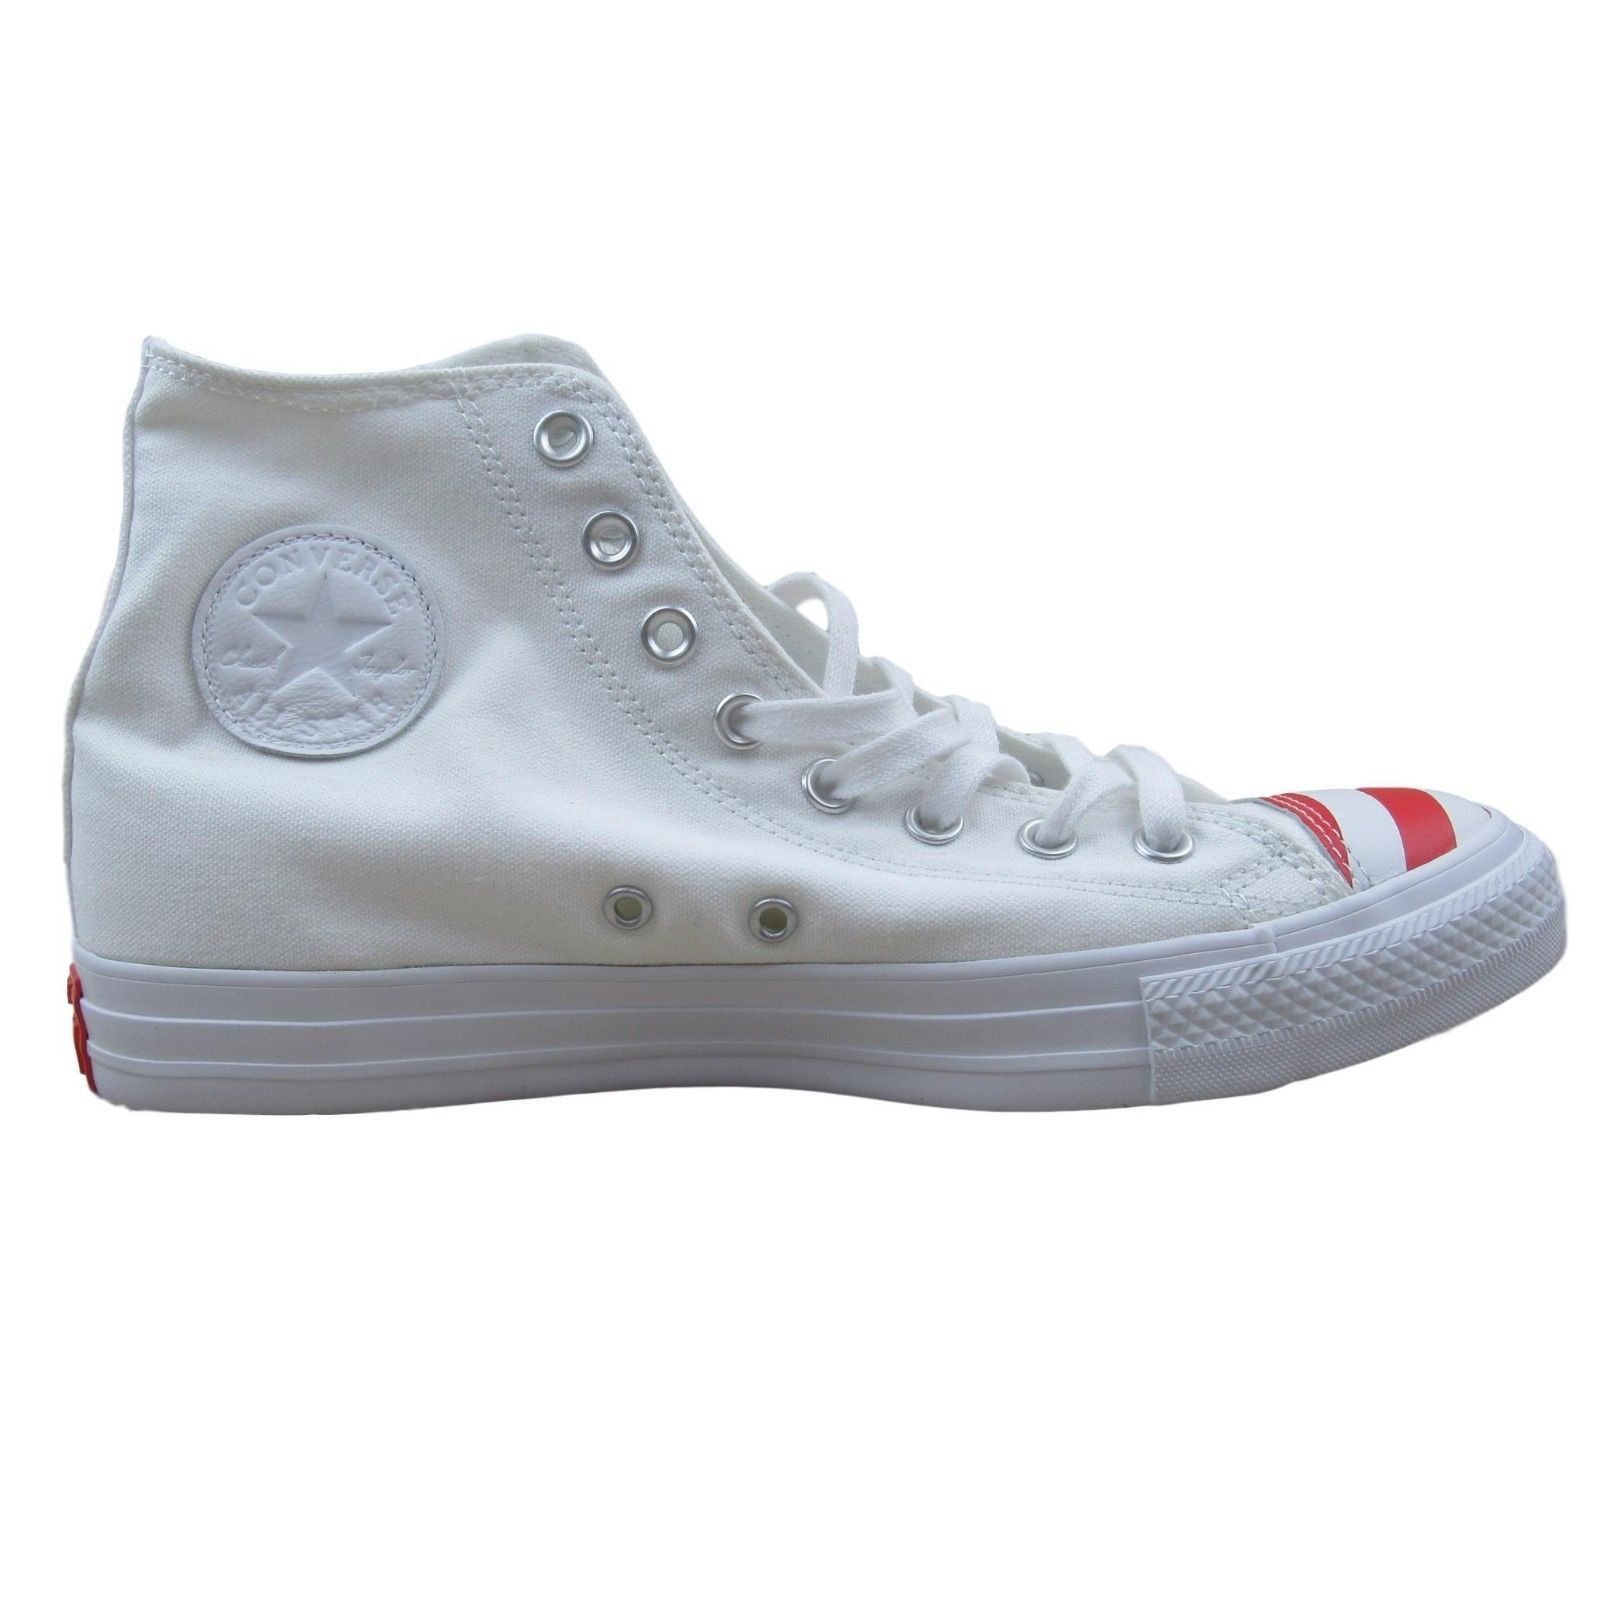 ff6fa4d6891 57. 57. Converse Chuck Taylor All Star High Size 9 Shoes Mens Toe Flag USA  White 153911C. Converse Chuck Taylor ...